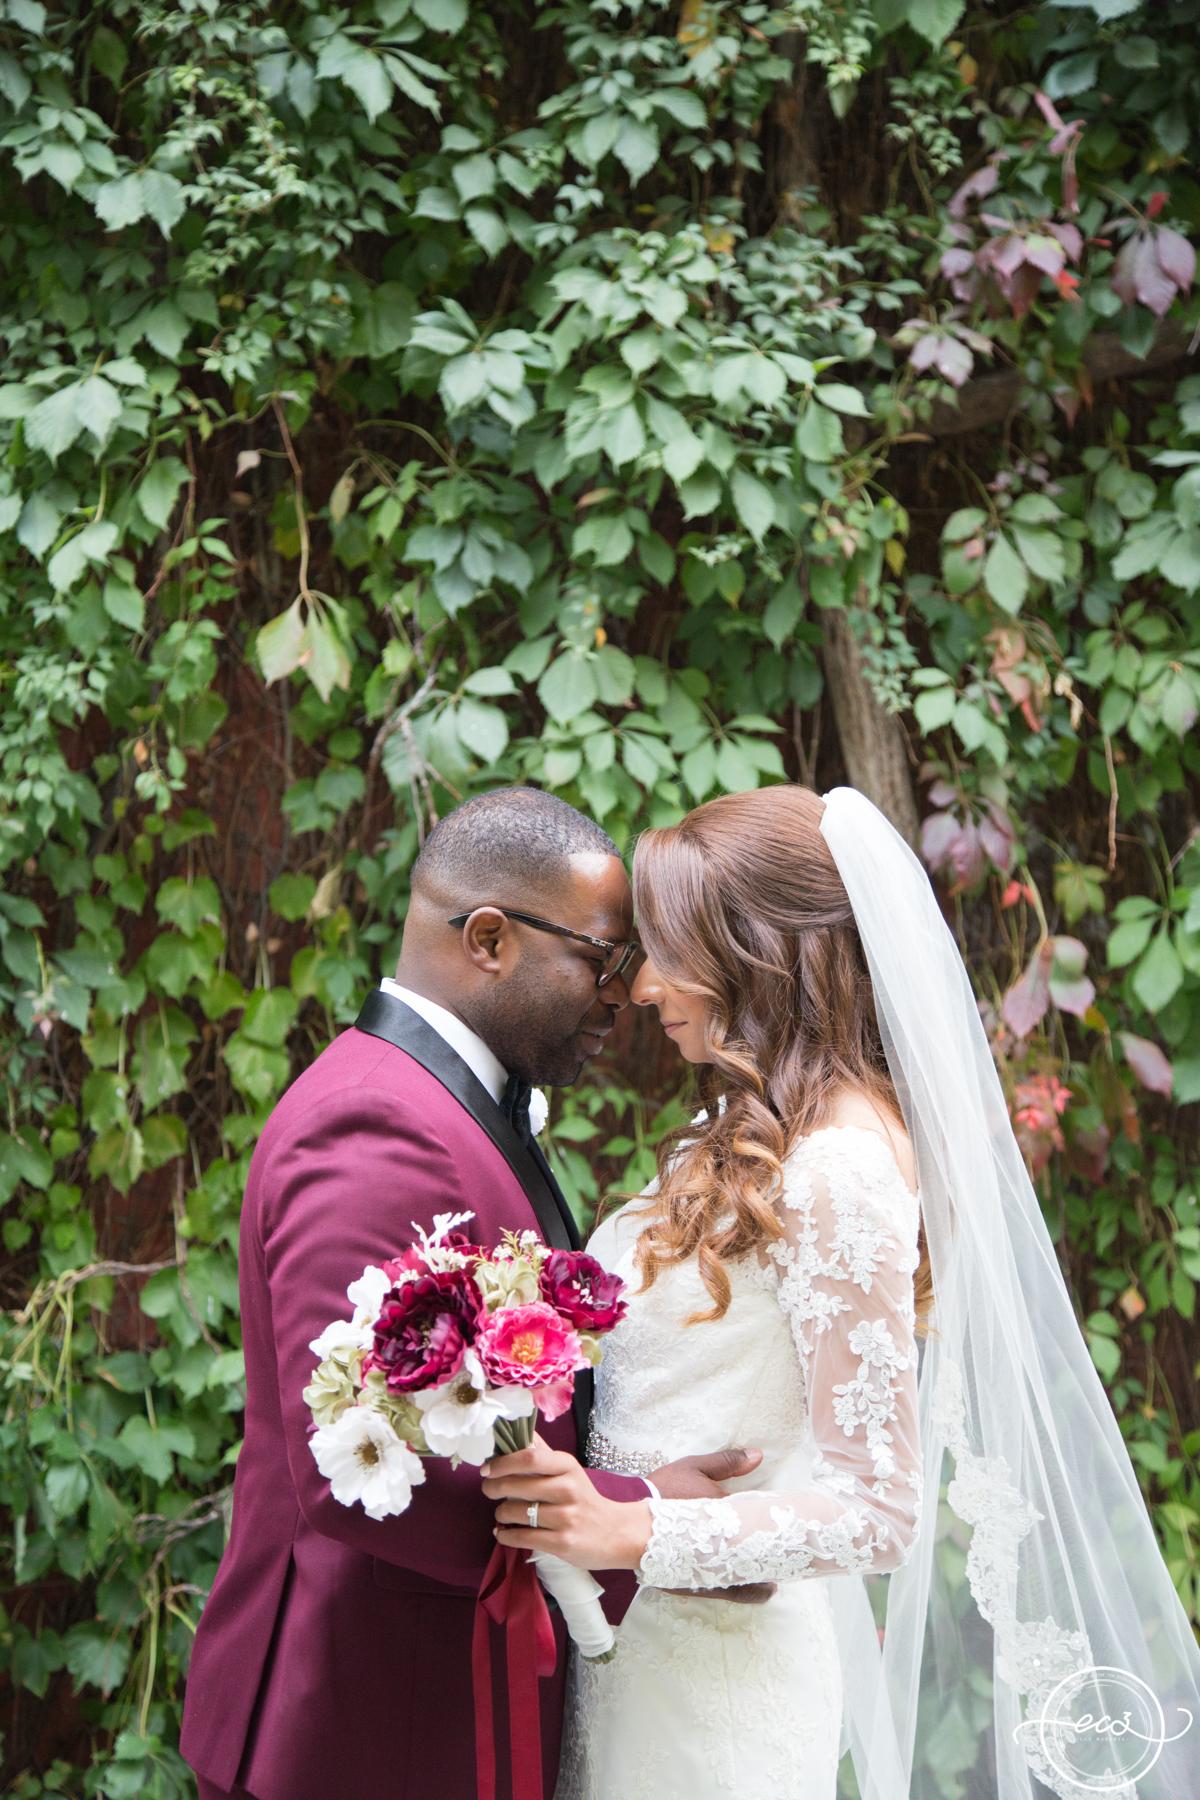 AA-Rustic-Toronto-Burroughes-Wedding34.jpg